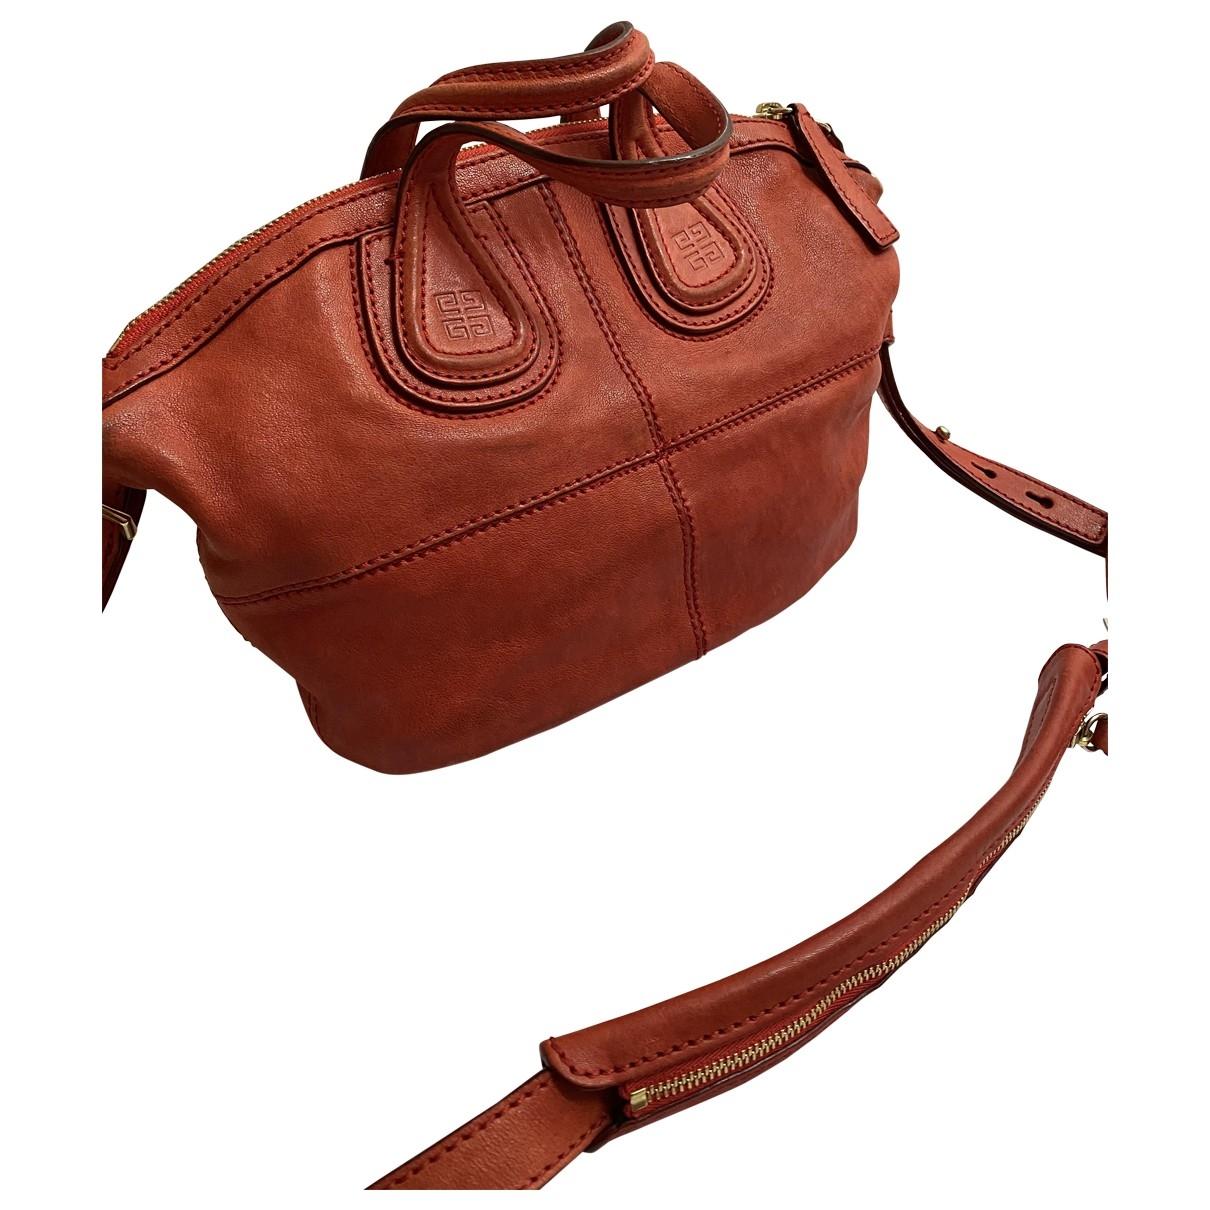 Givenchy - Sac a main Nightingale pour femme en cuir - rouge